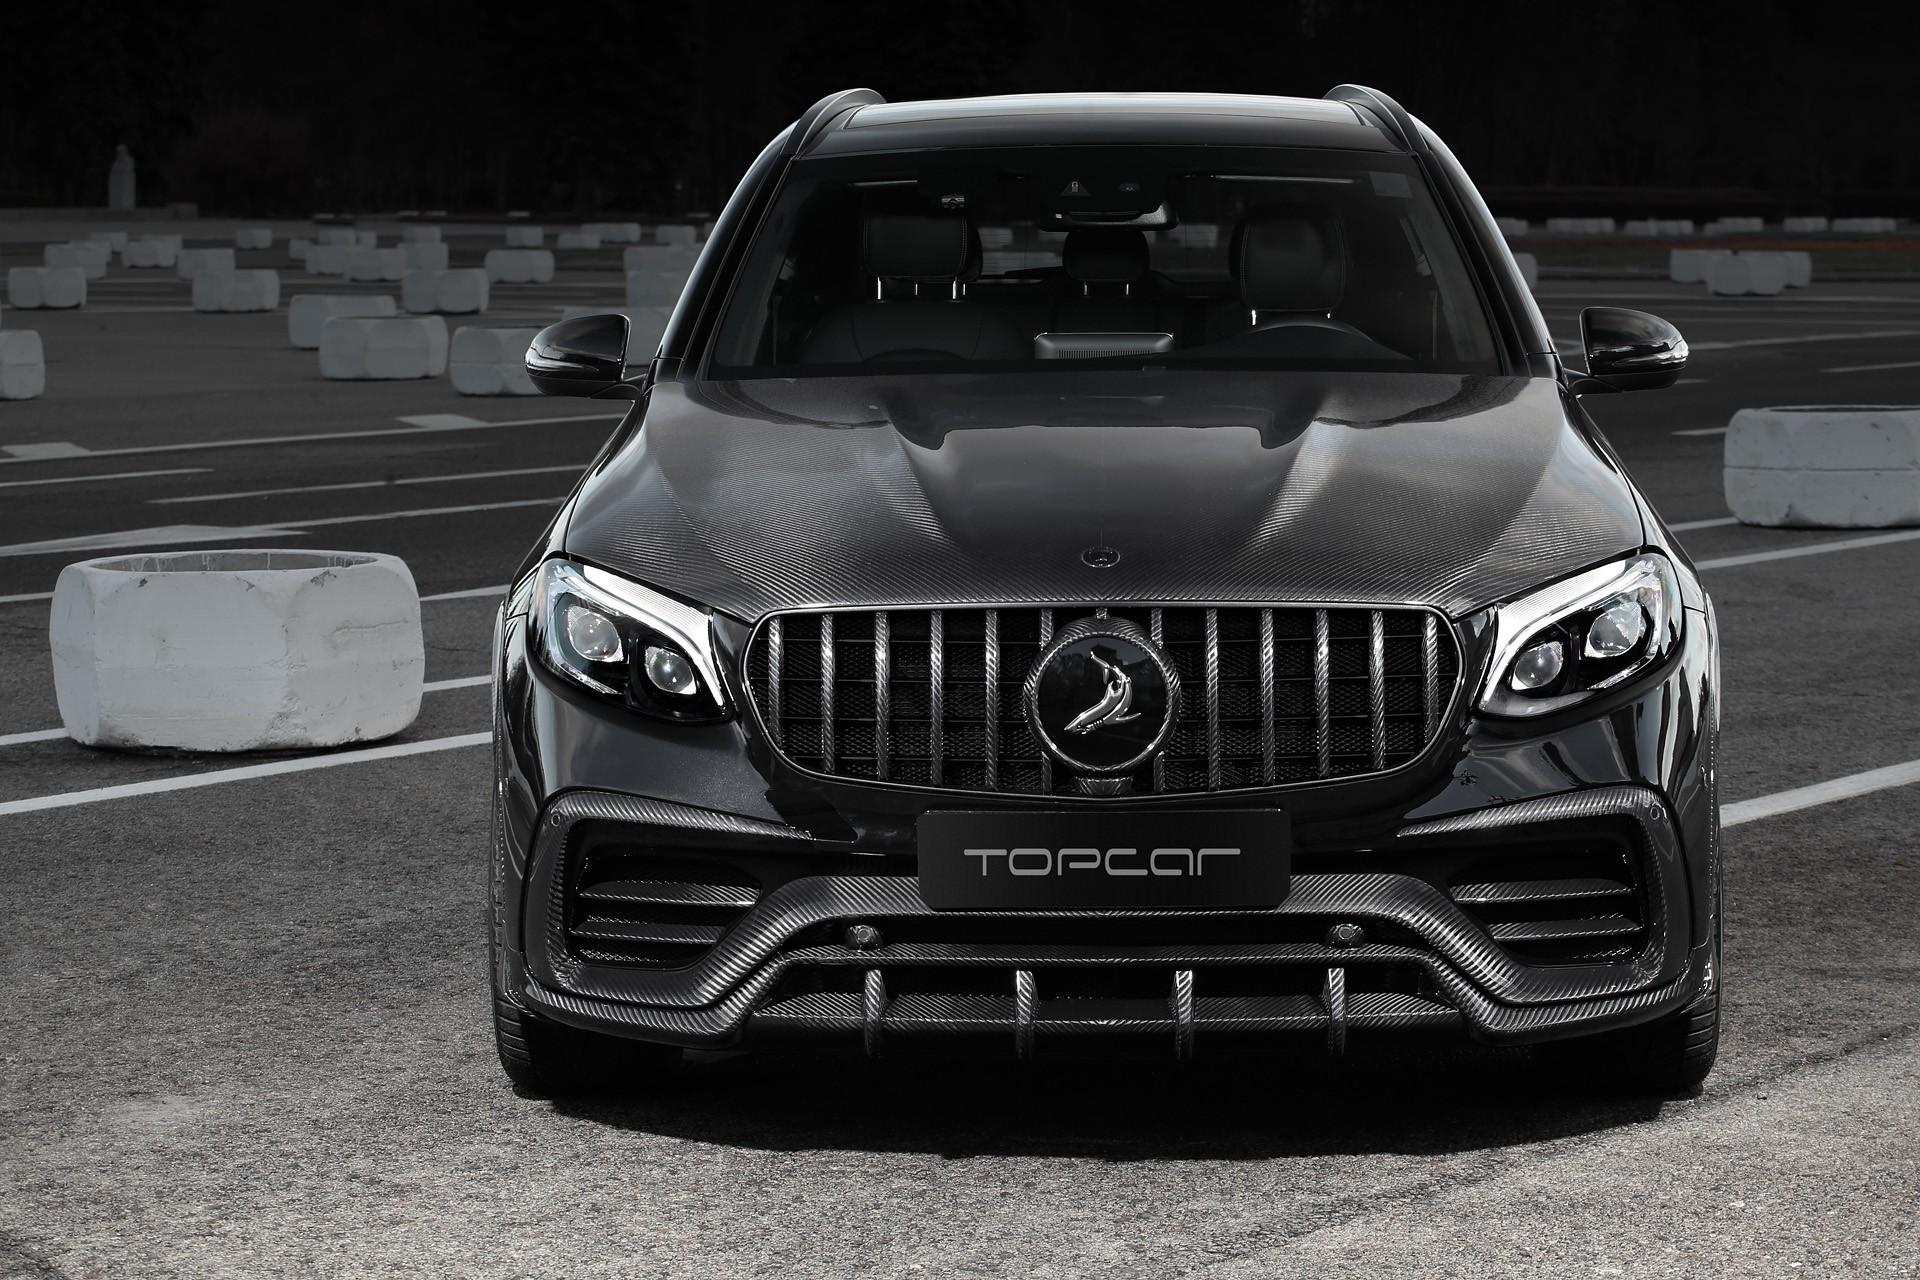 Mercedes-Benz GLC Wagon INFERNO / TopCar design